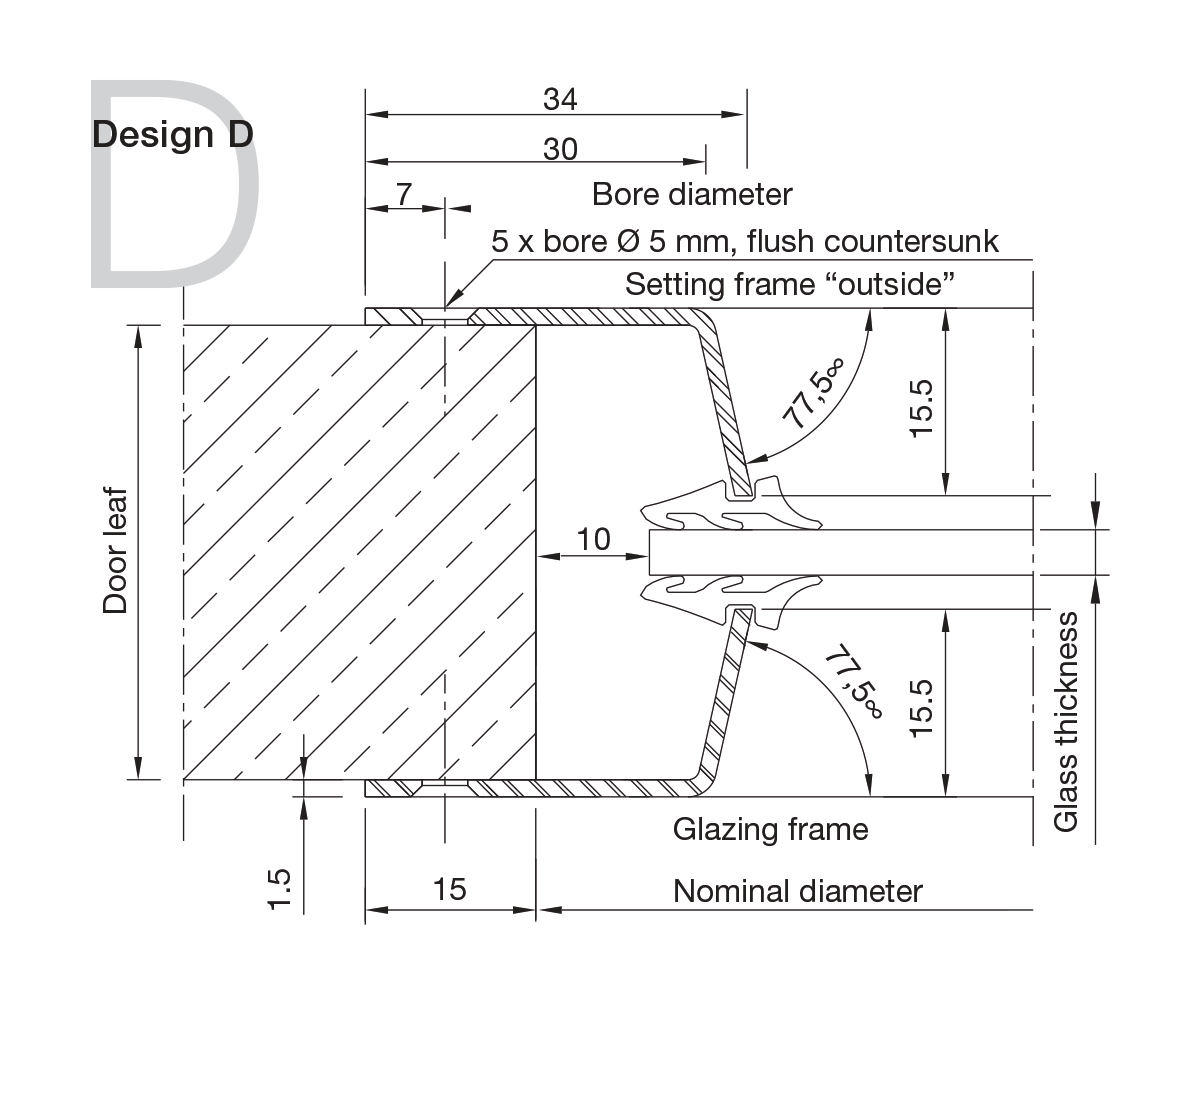 Stainless Steel Portholes Design D